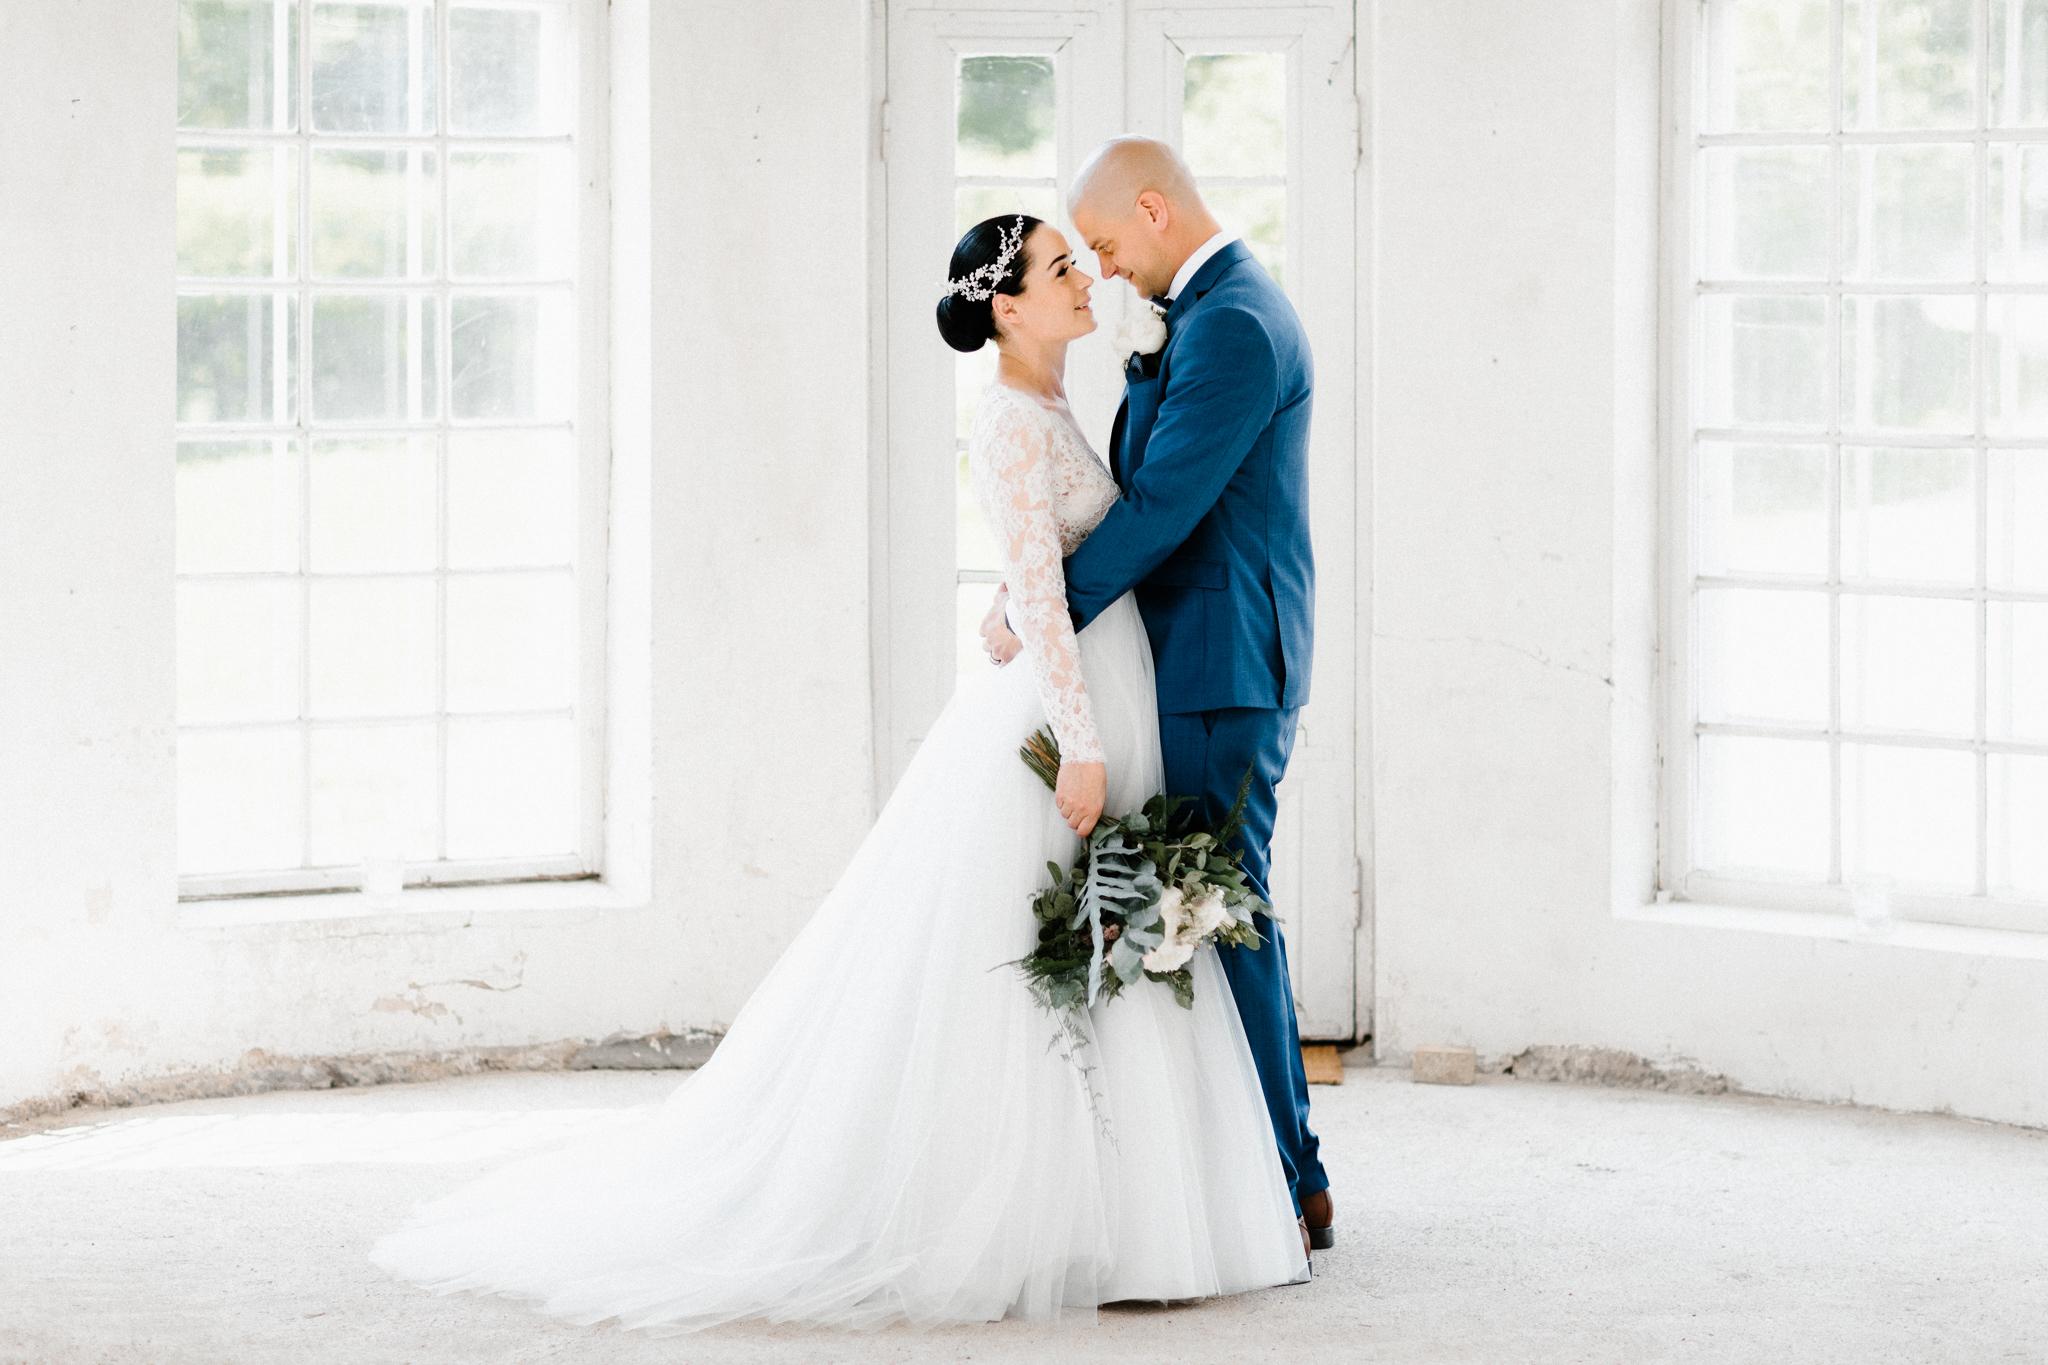 Essi + Ville   Oitbacka Gården   by Patrick Karkkolainen Wedding Photography-56.jpg